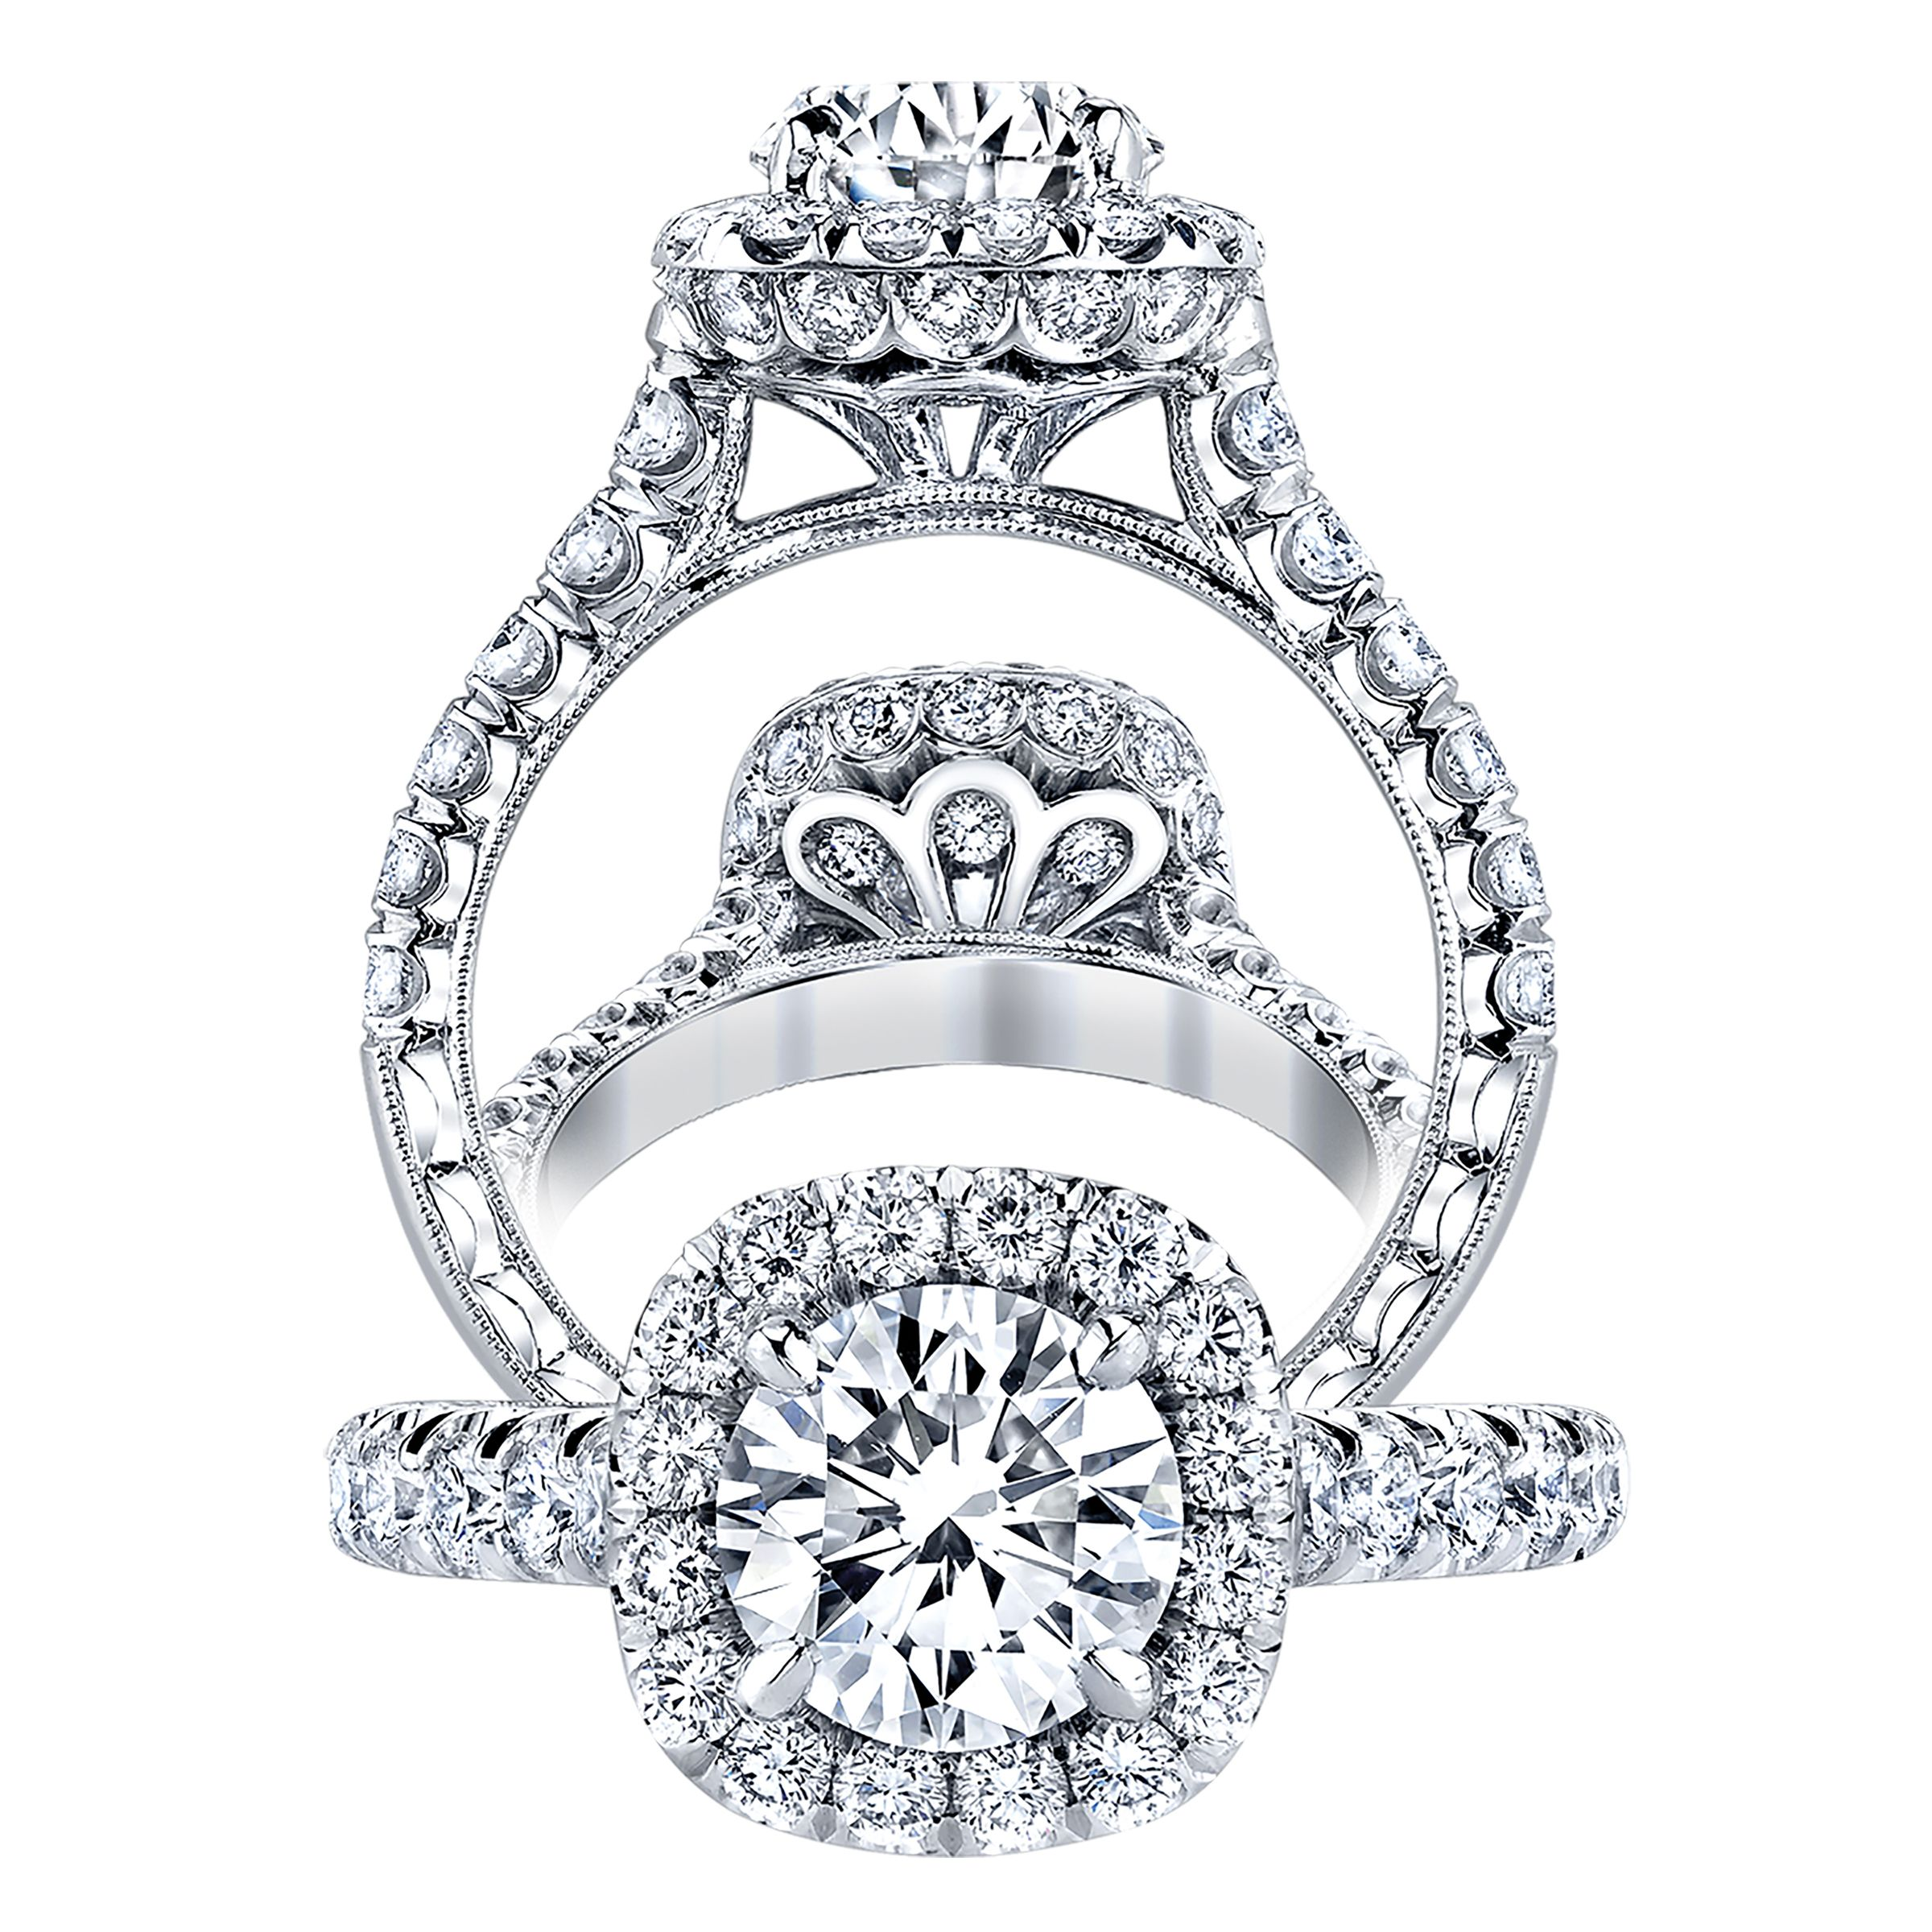 KPR 649 Platinum Engagement Ring Handmade engagement